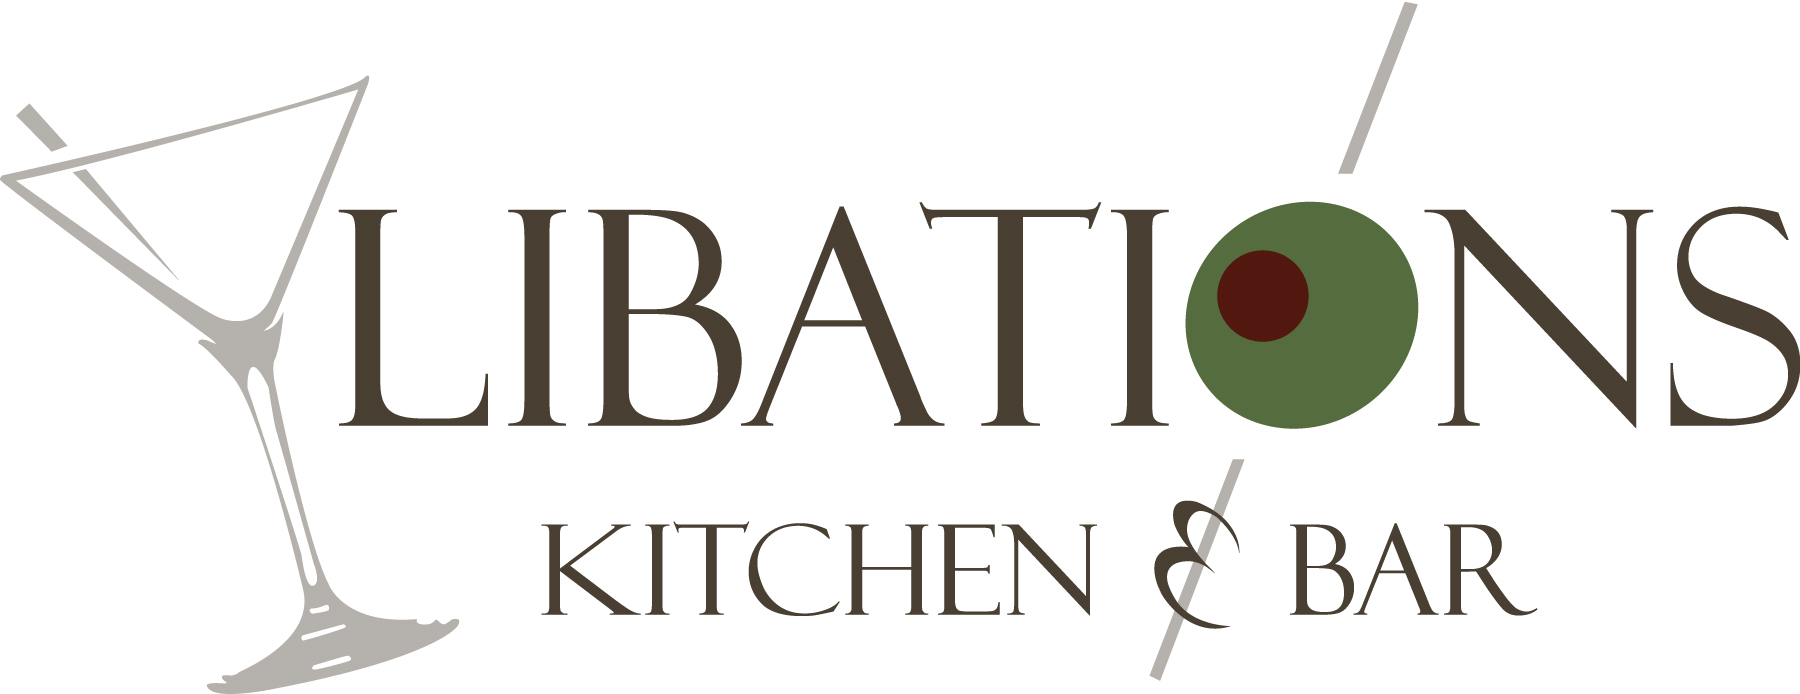 Libations updated new logo